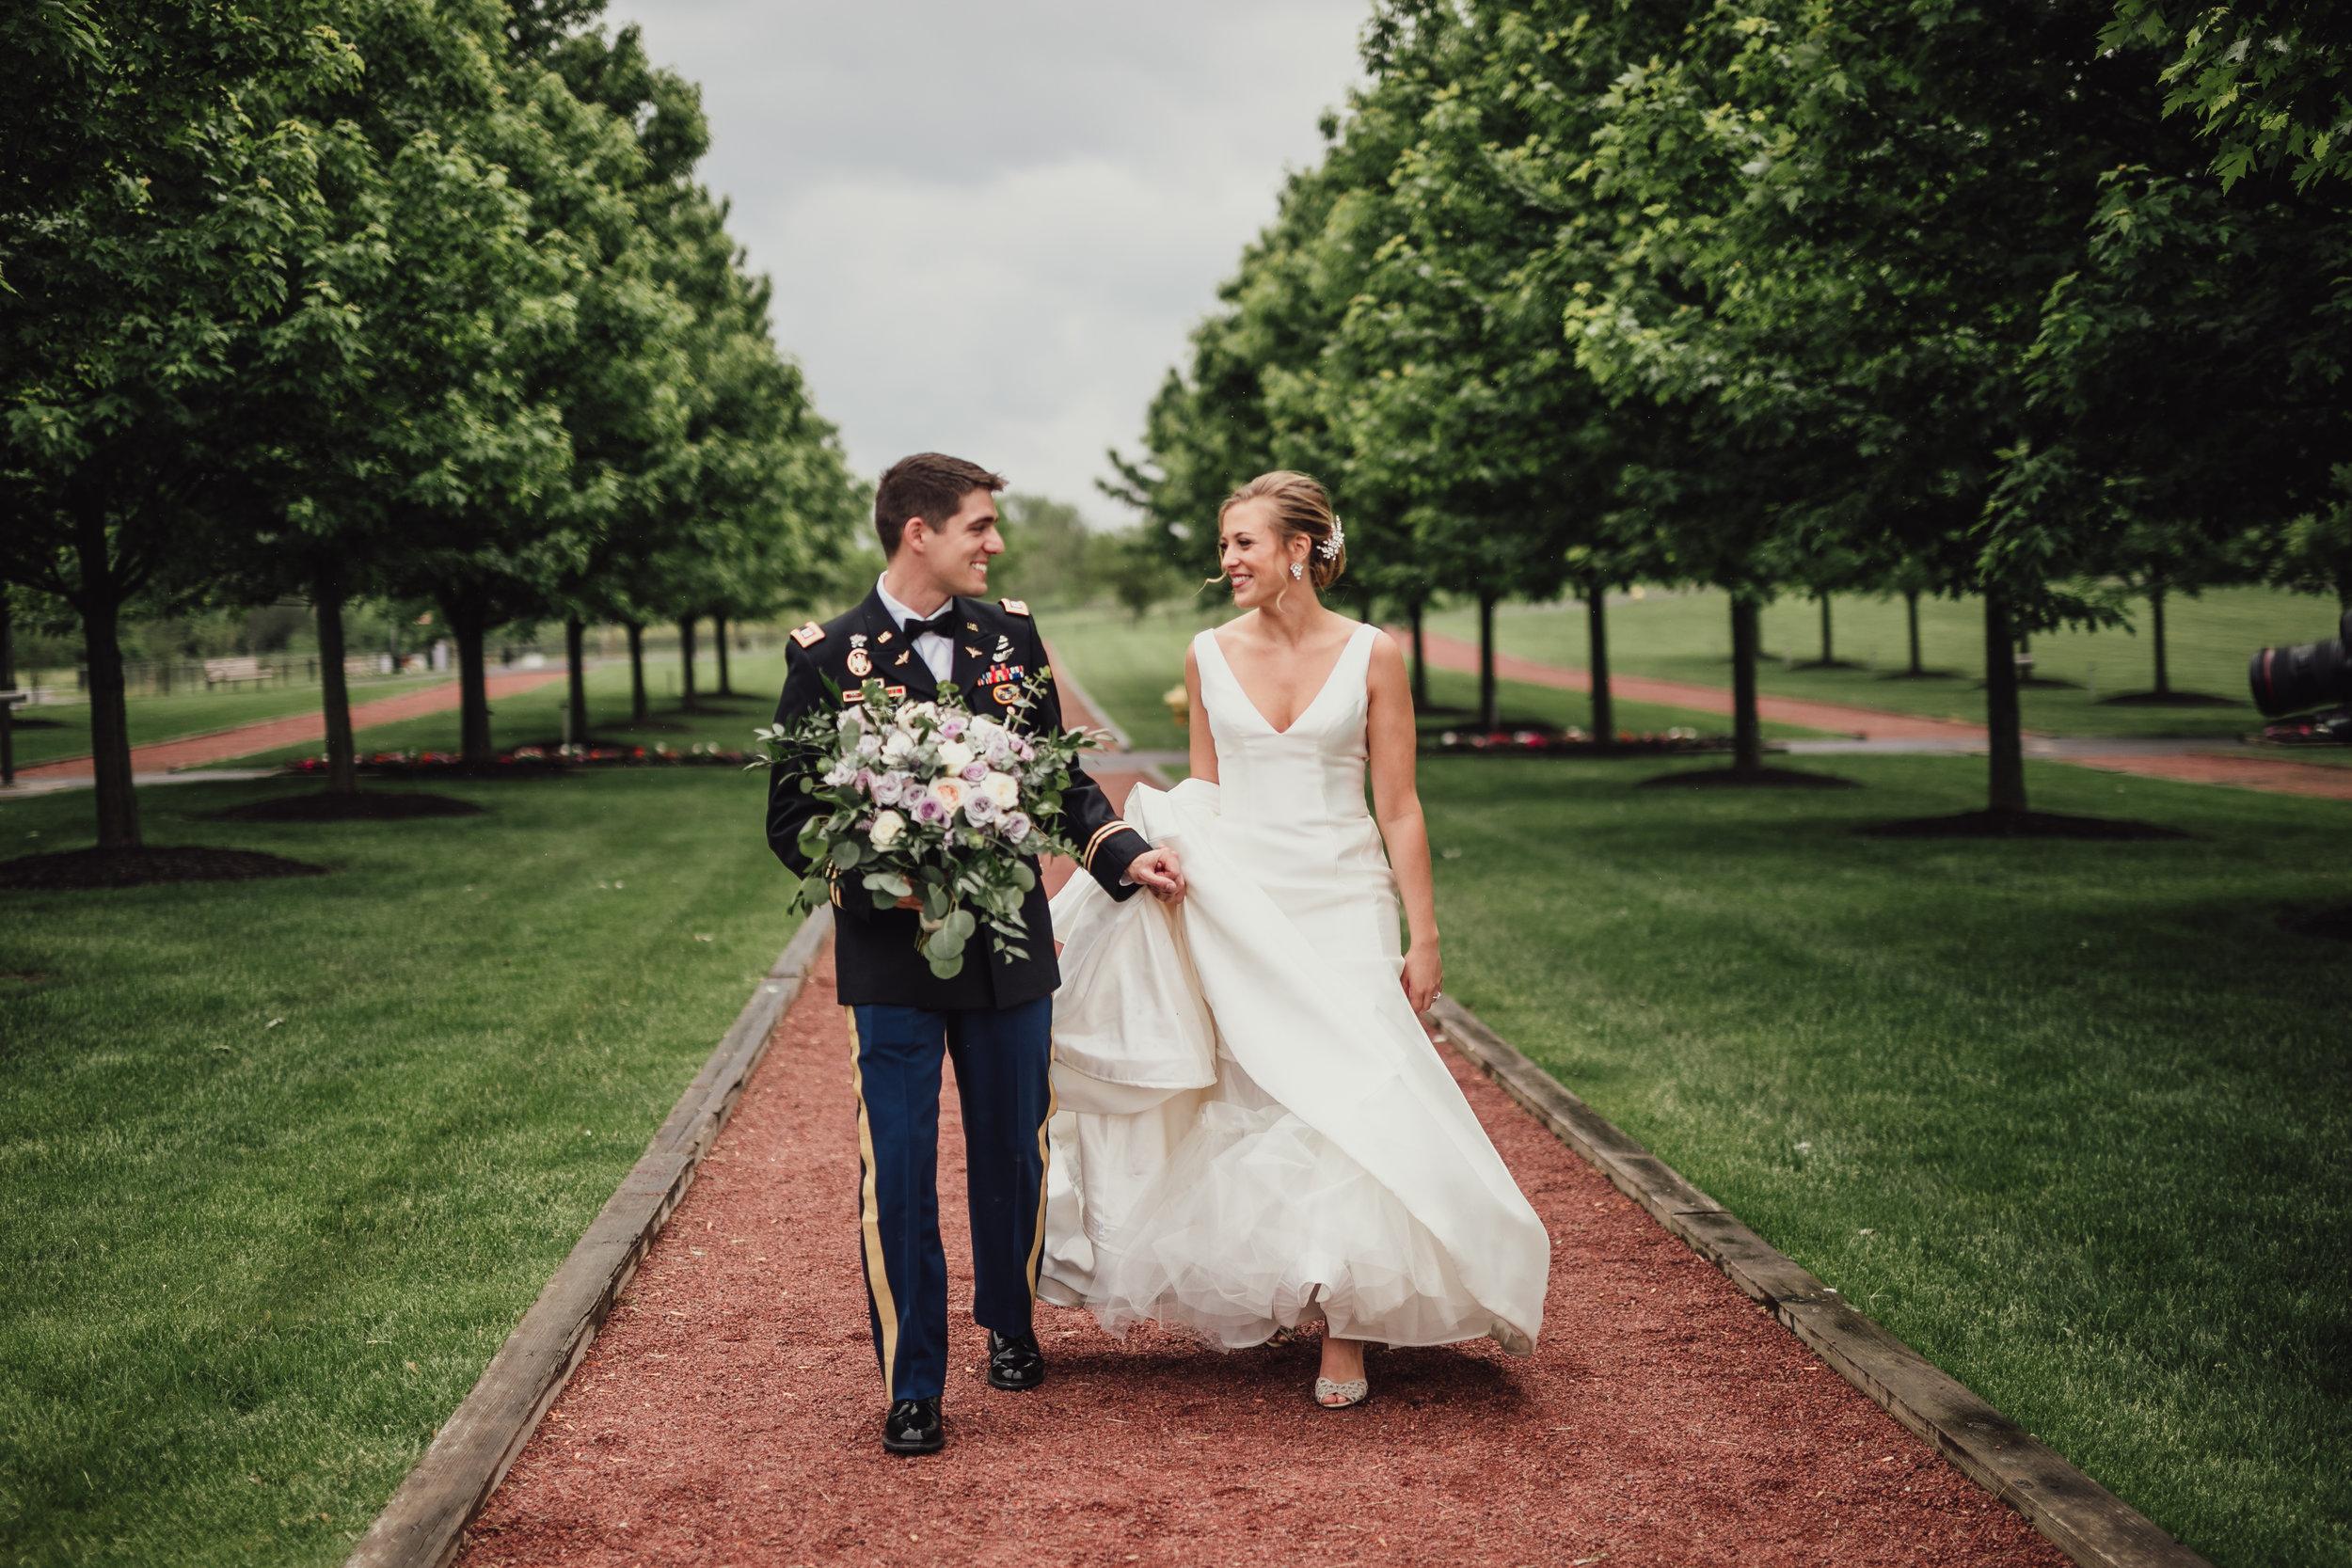 Centennial-Park-Munster-indiana-bride-and-groom-Lauren-ashley-studios-walking.jpg